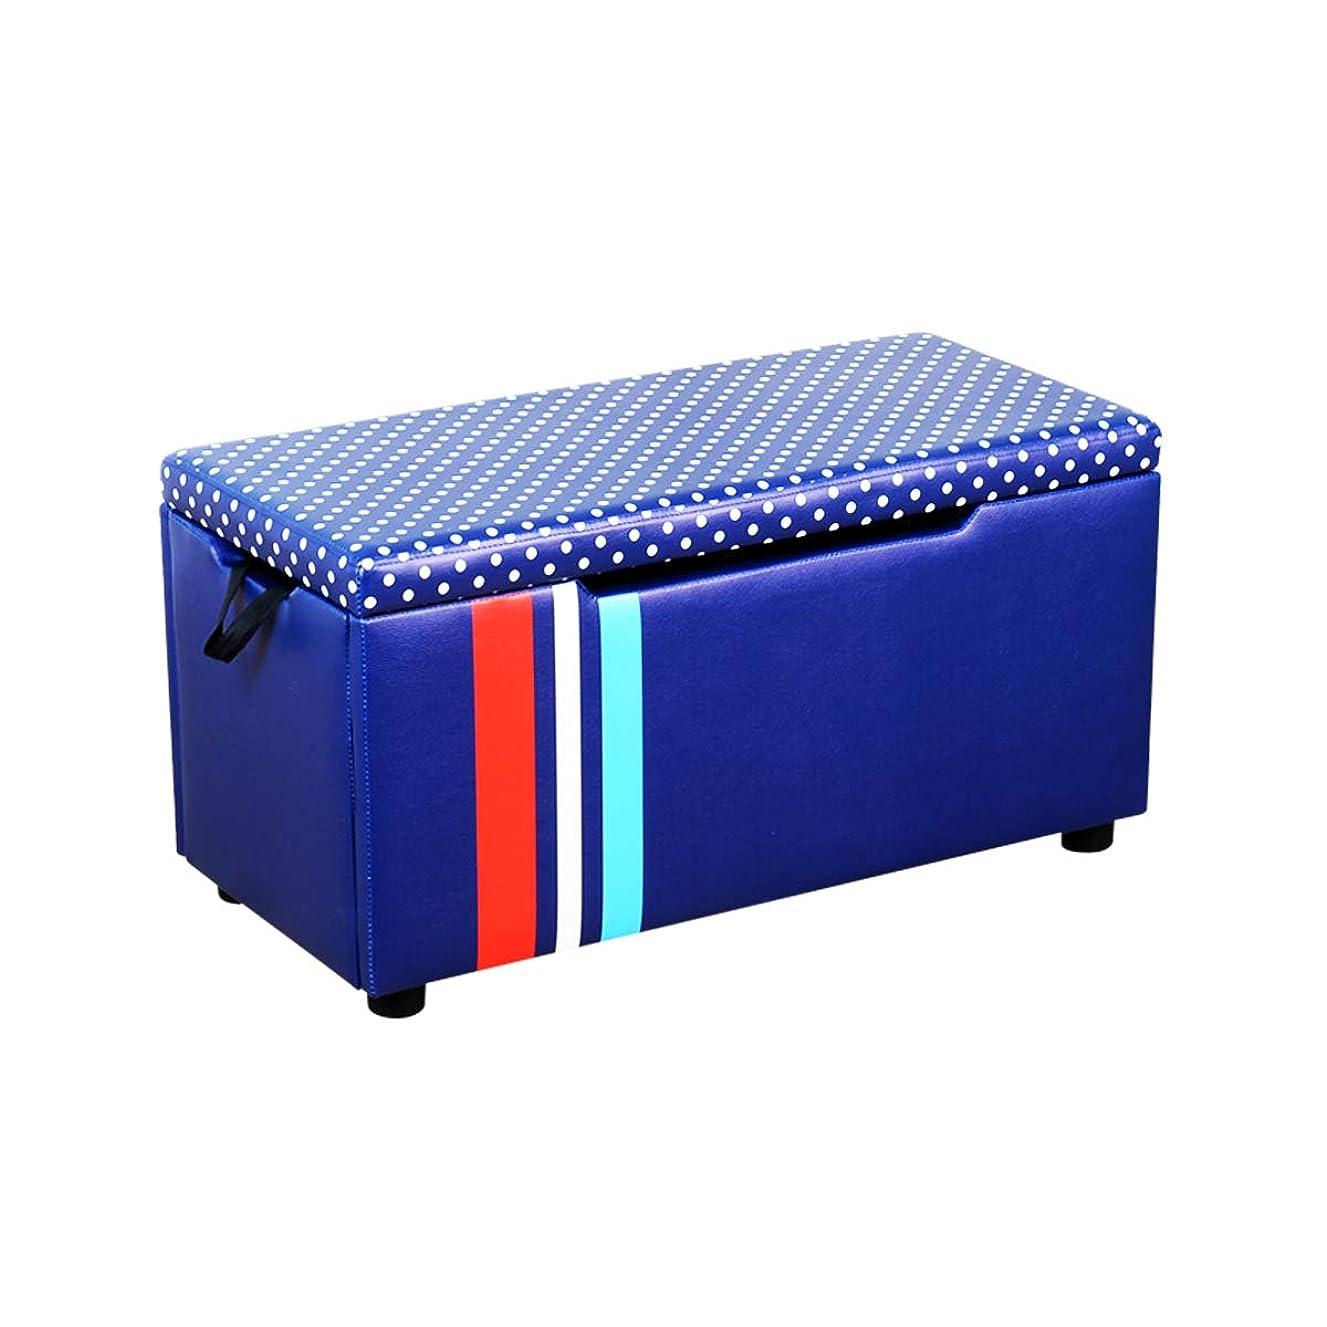 Babyland Folding Stool Storage Ottoman Bench Blue Rectangular Footstool